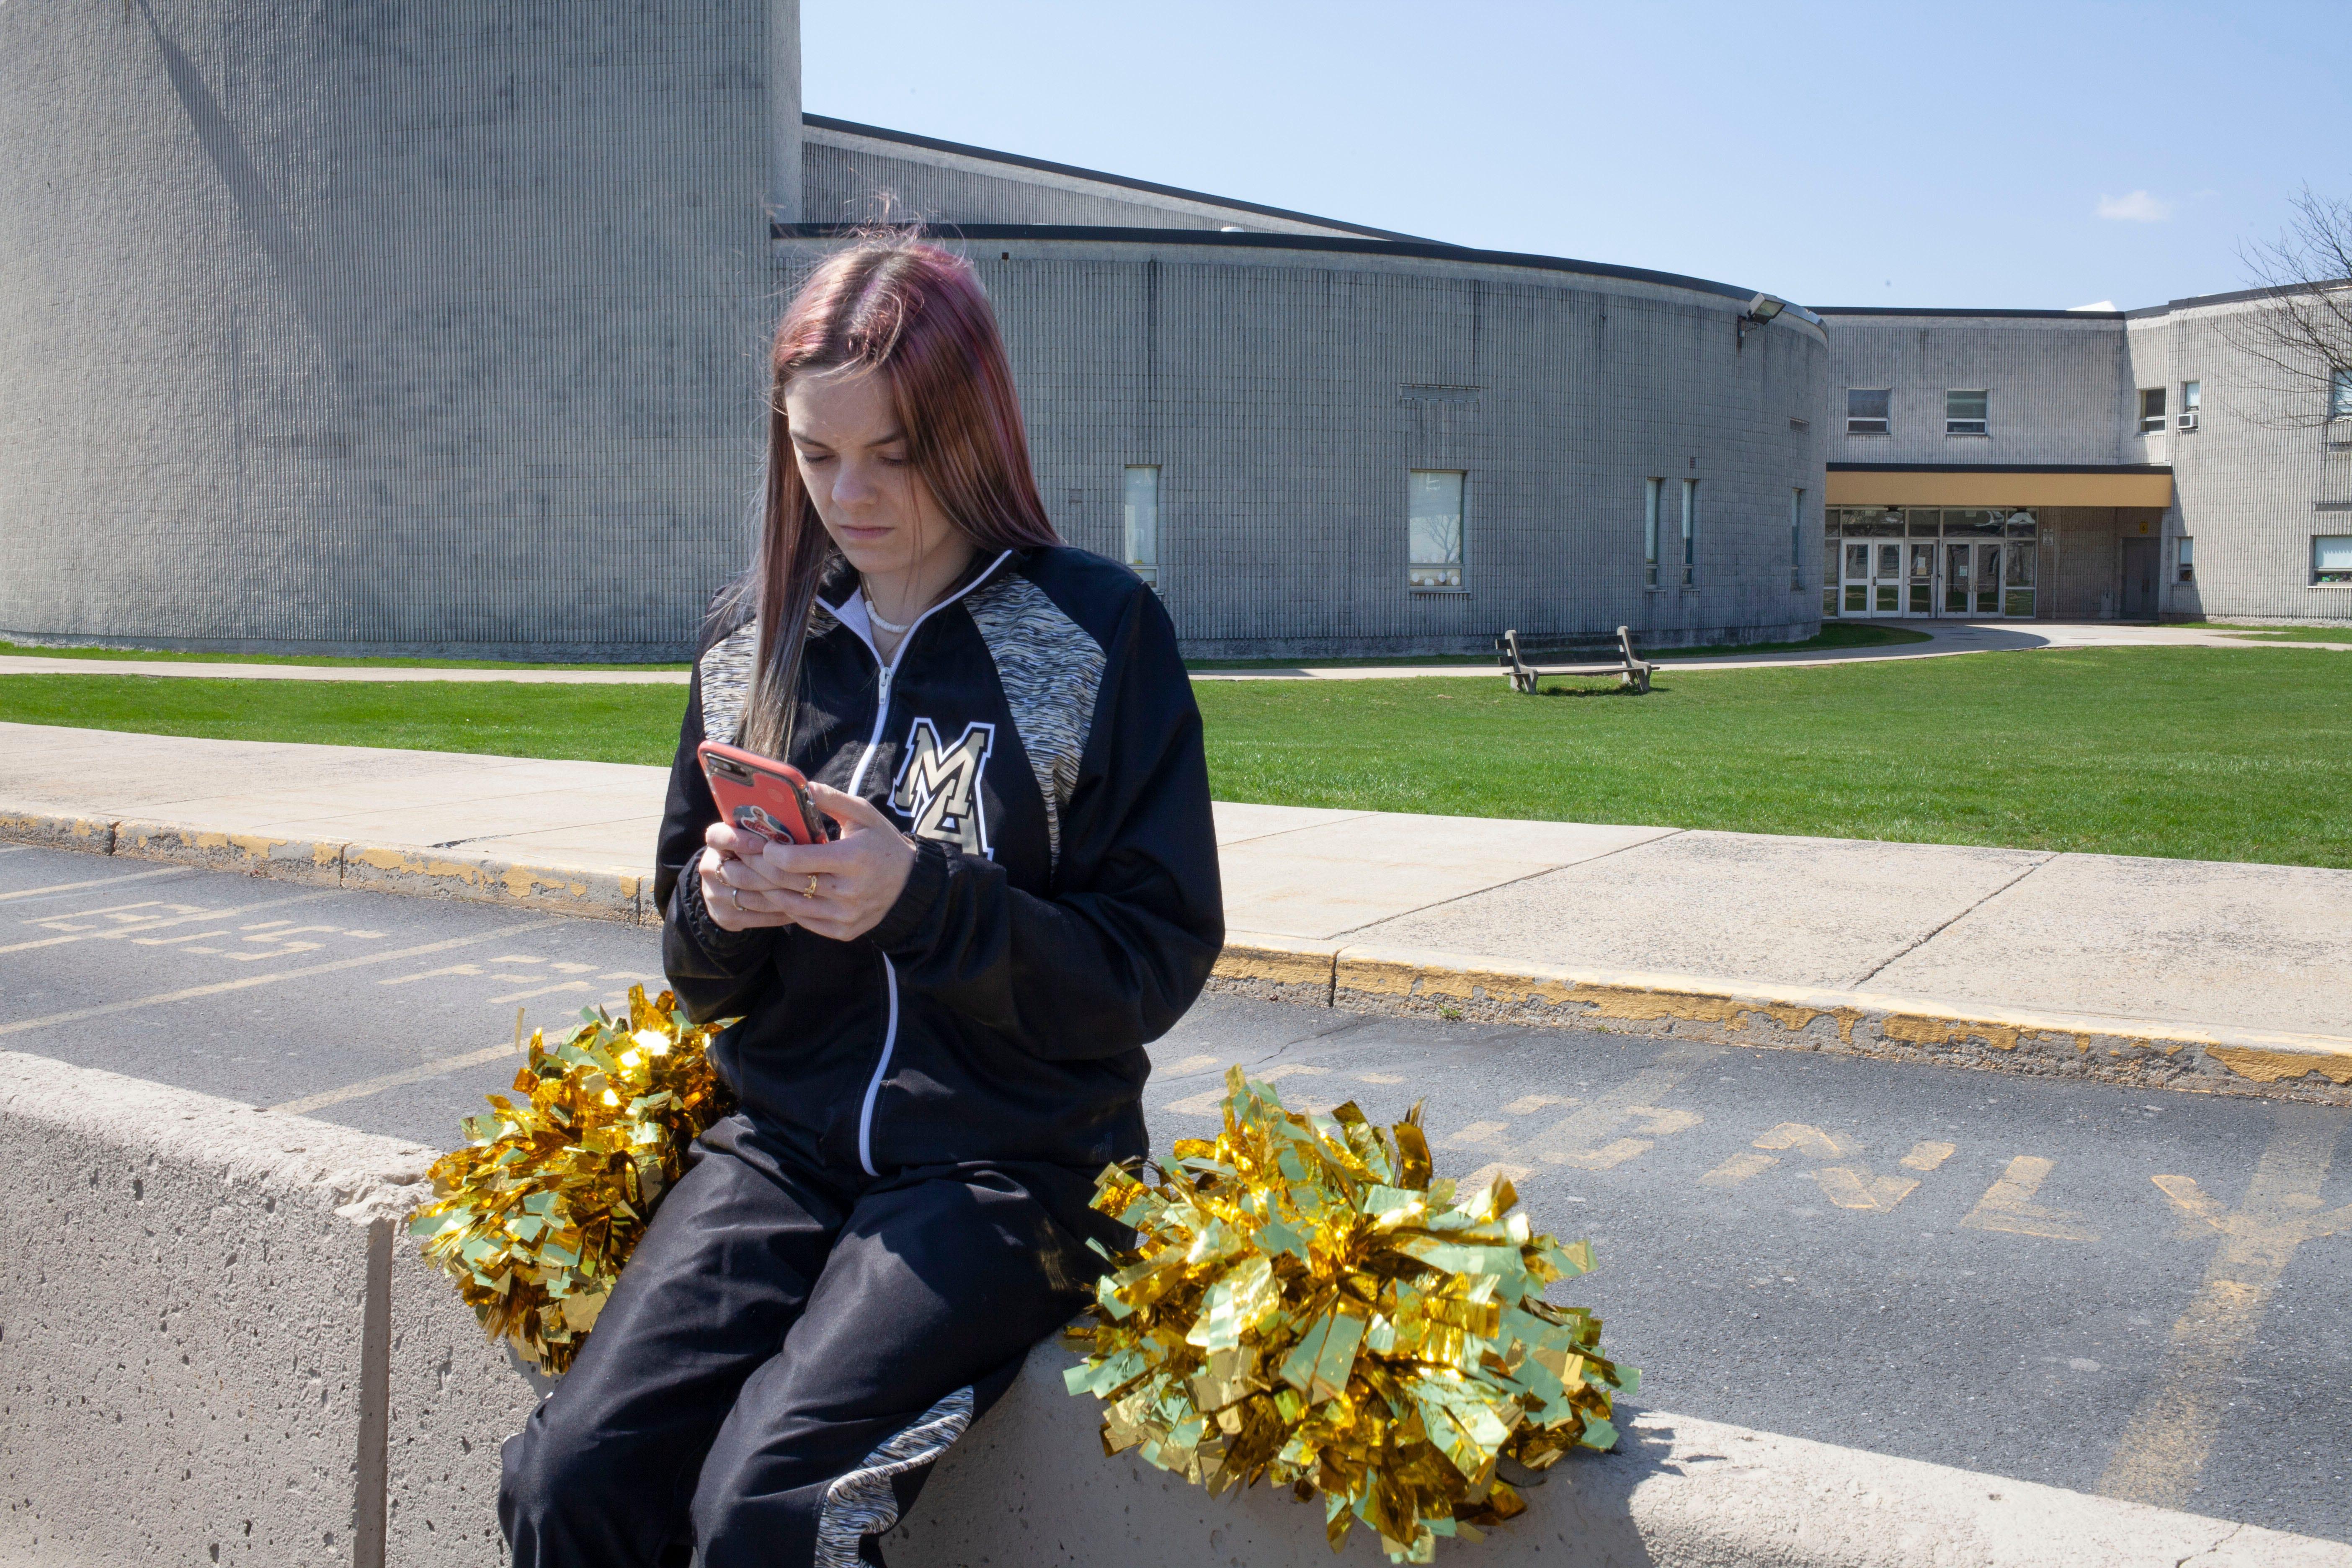 Supreme Court sides with cheerleader who wrote profane social media post slamming her school